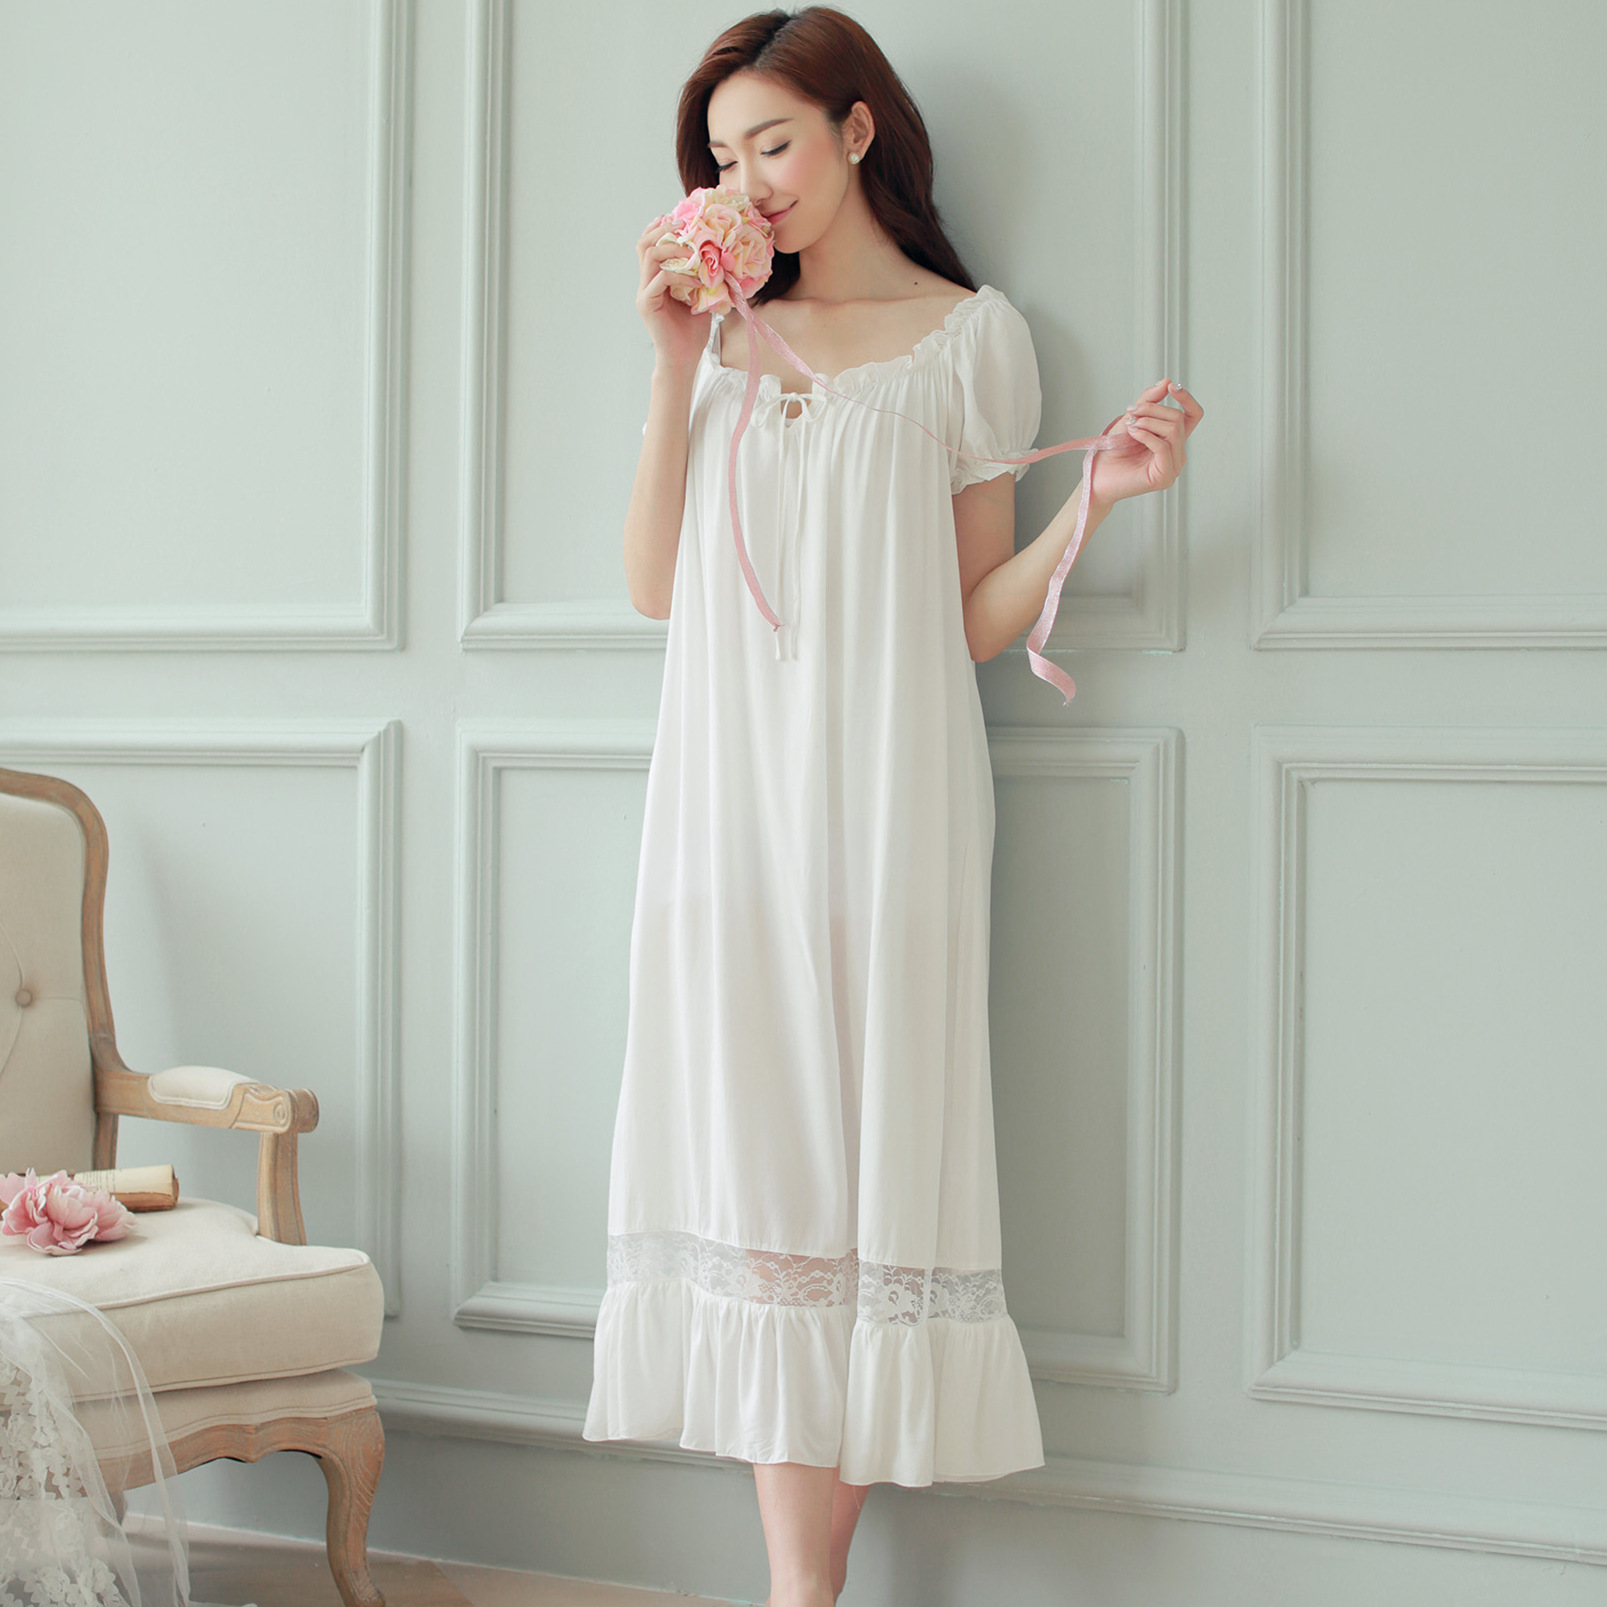 Summer Women Nightgowns White Cotton Short Sleeve Nightdress Vintage Long Sleepwear Lace Sexy Nightwear Home Night Dress 2020